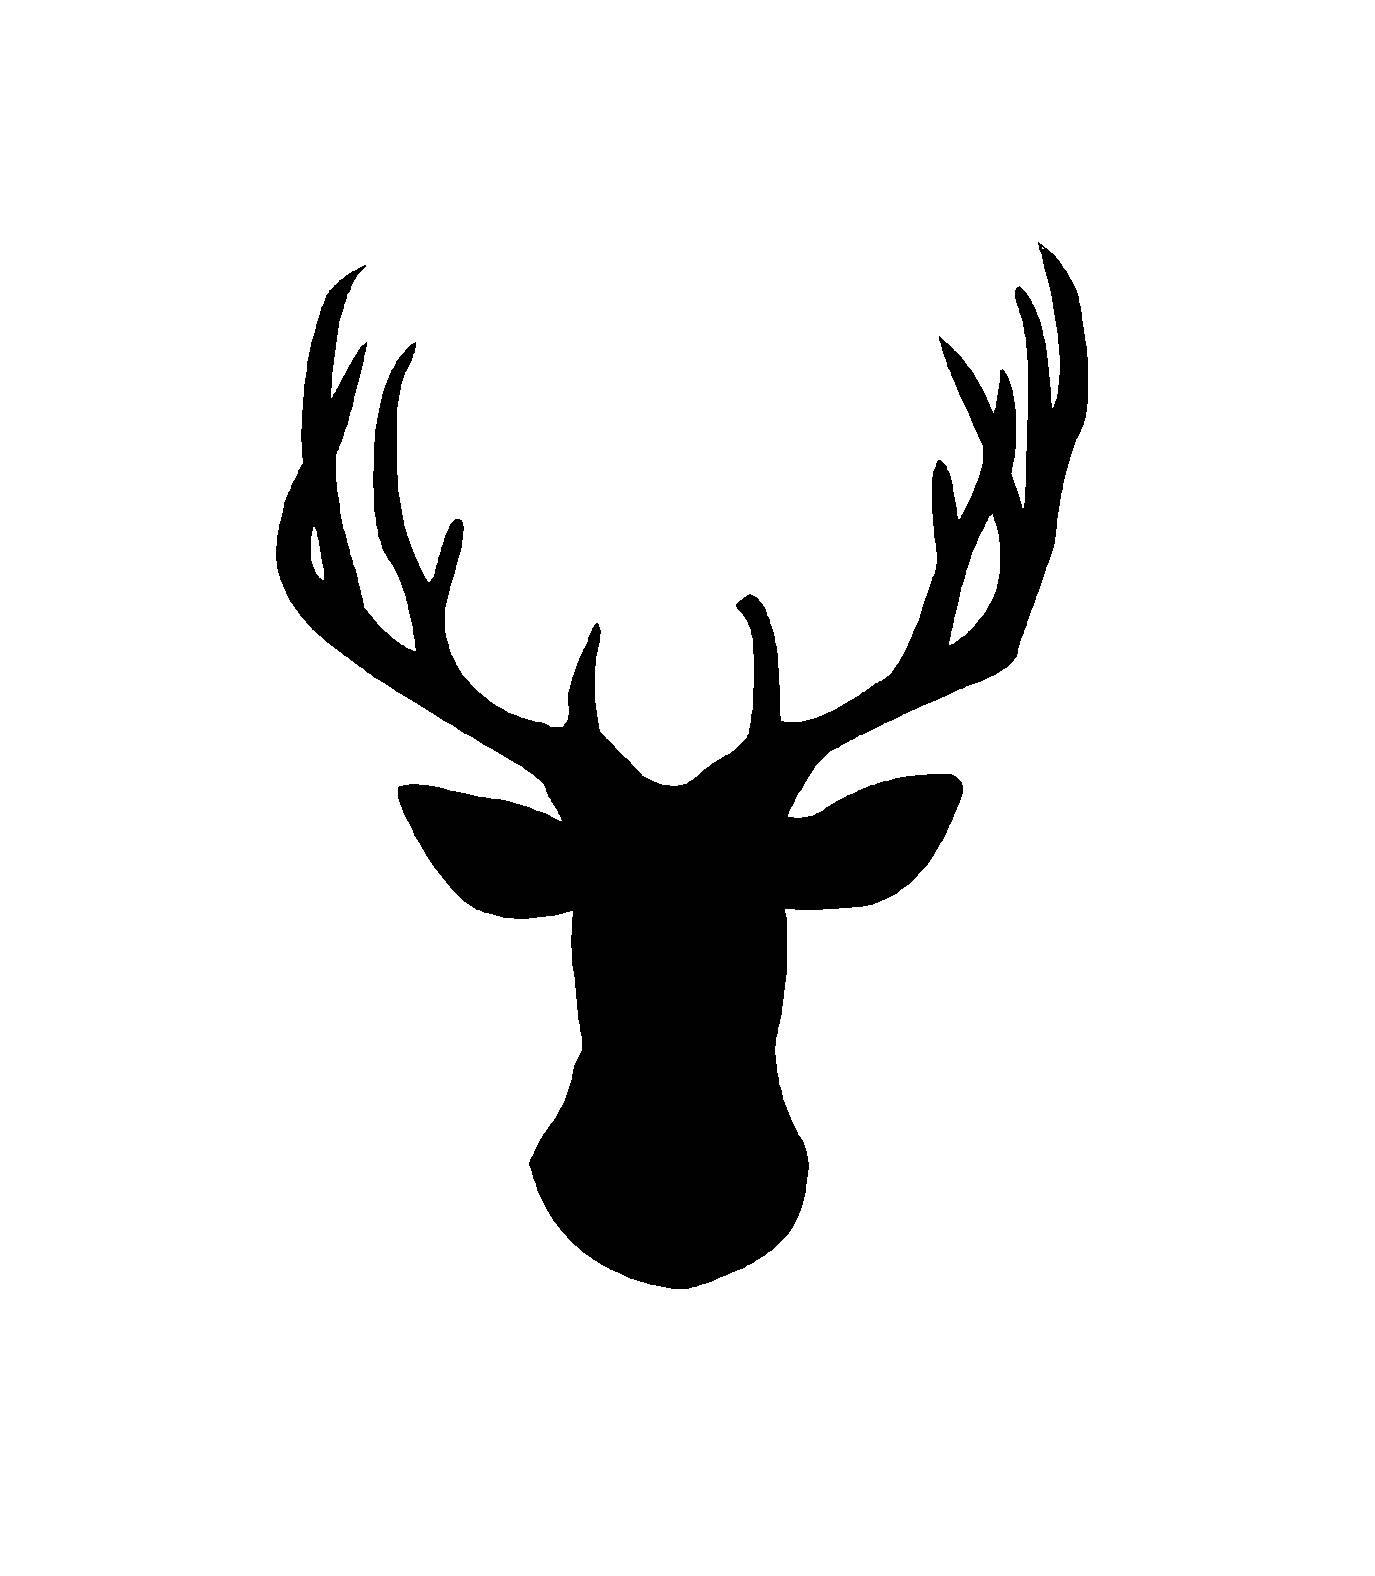 1375x1576 Deer Svg And Png Digital Download Deer Graphic Digital Etsy